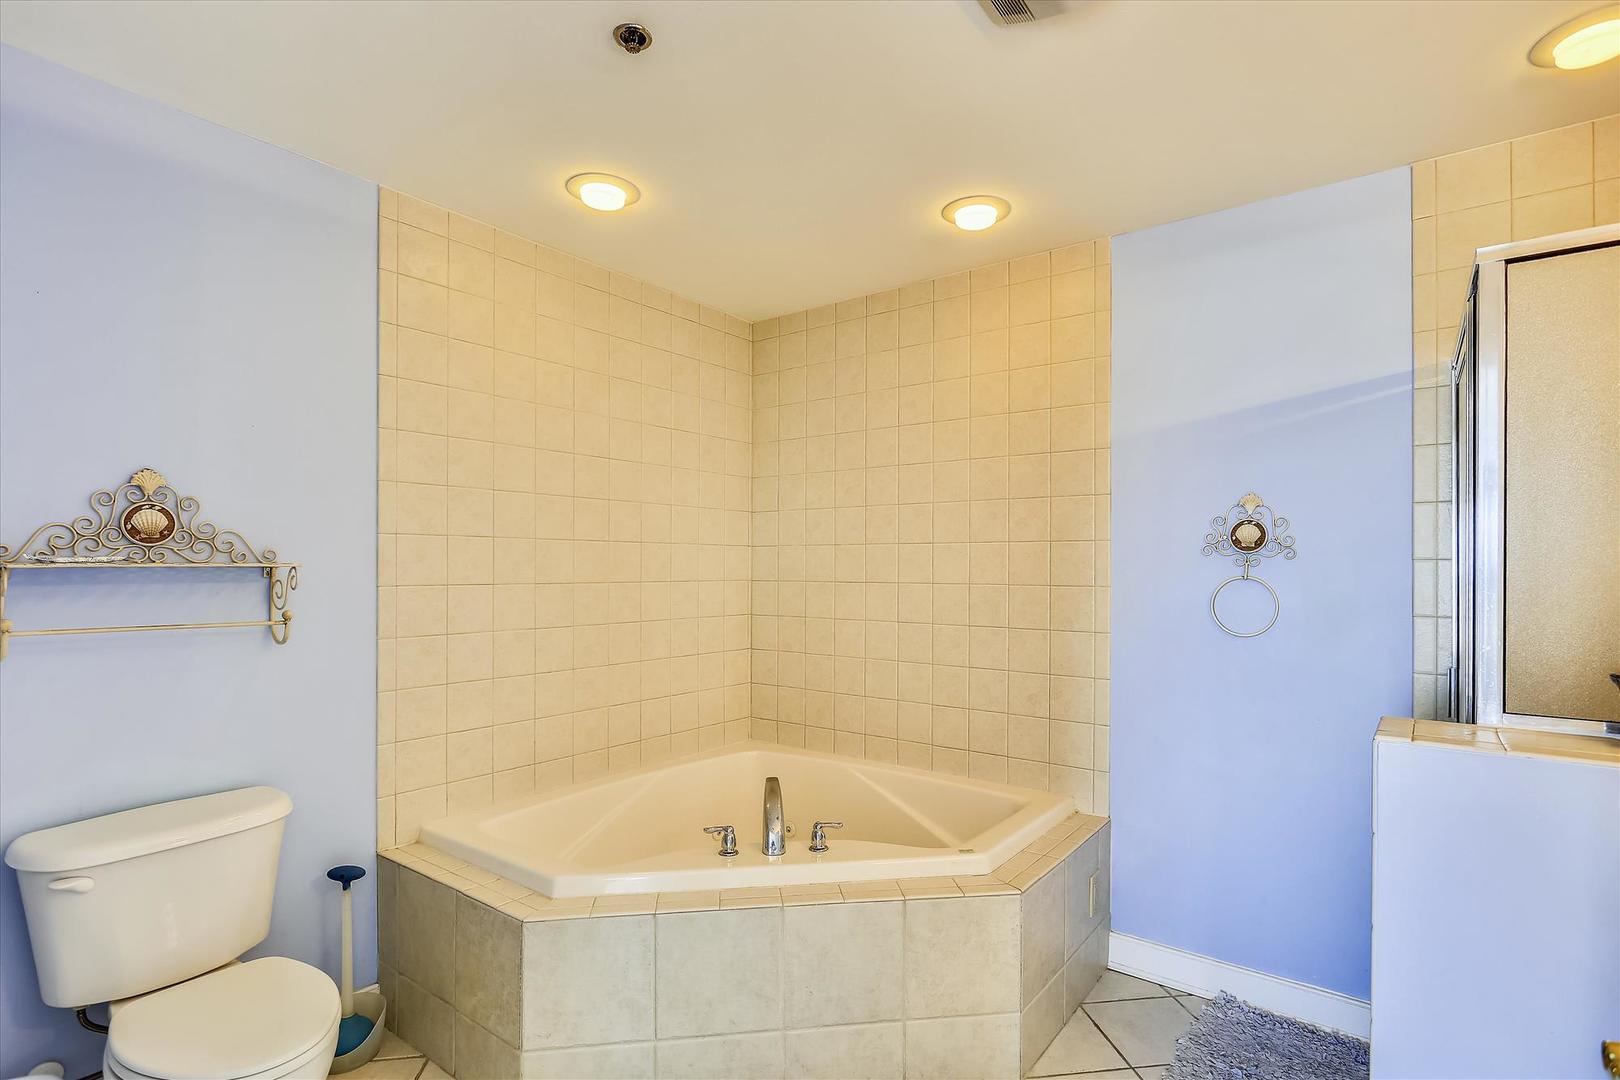 Sunset Bay II 518 - Master Bathroom